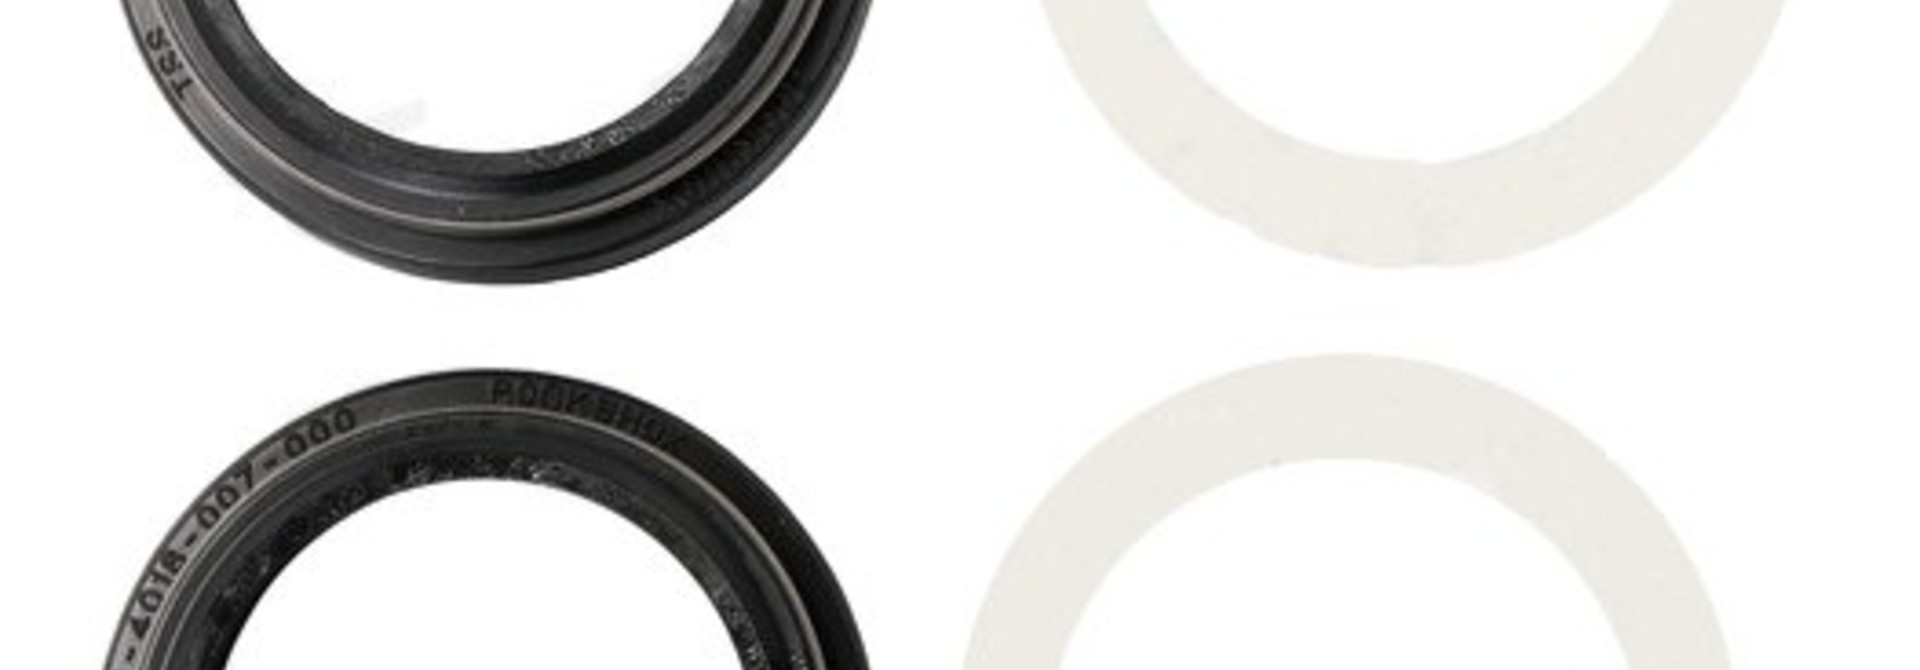 RockShox, Bluto/RS1, Boost, Dust Seals and Foam Rings, 32mm, PAIR